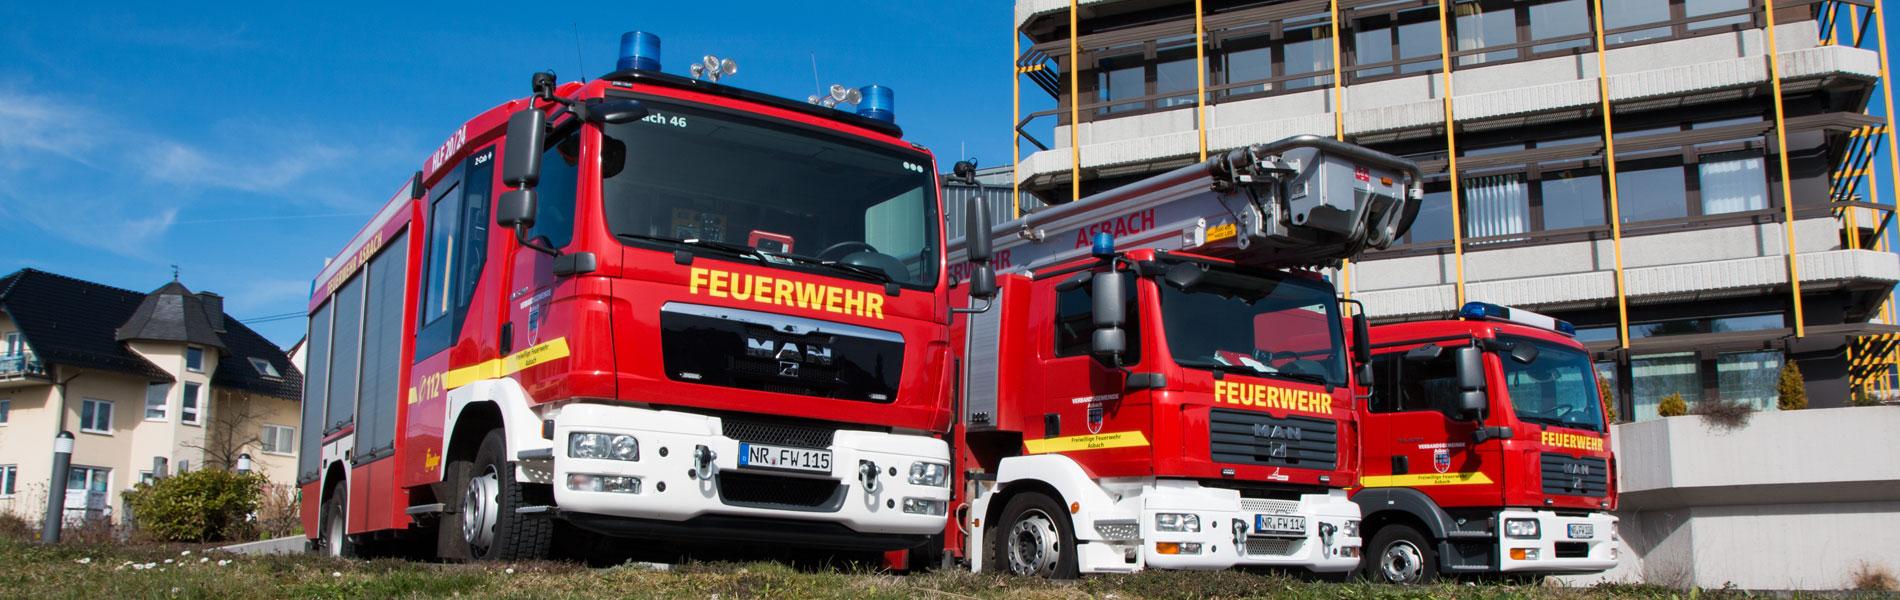 Feuerwehr-Asbach_Fahrzeuge_VG-Asbach